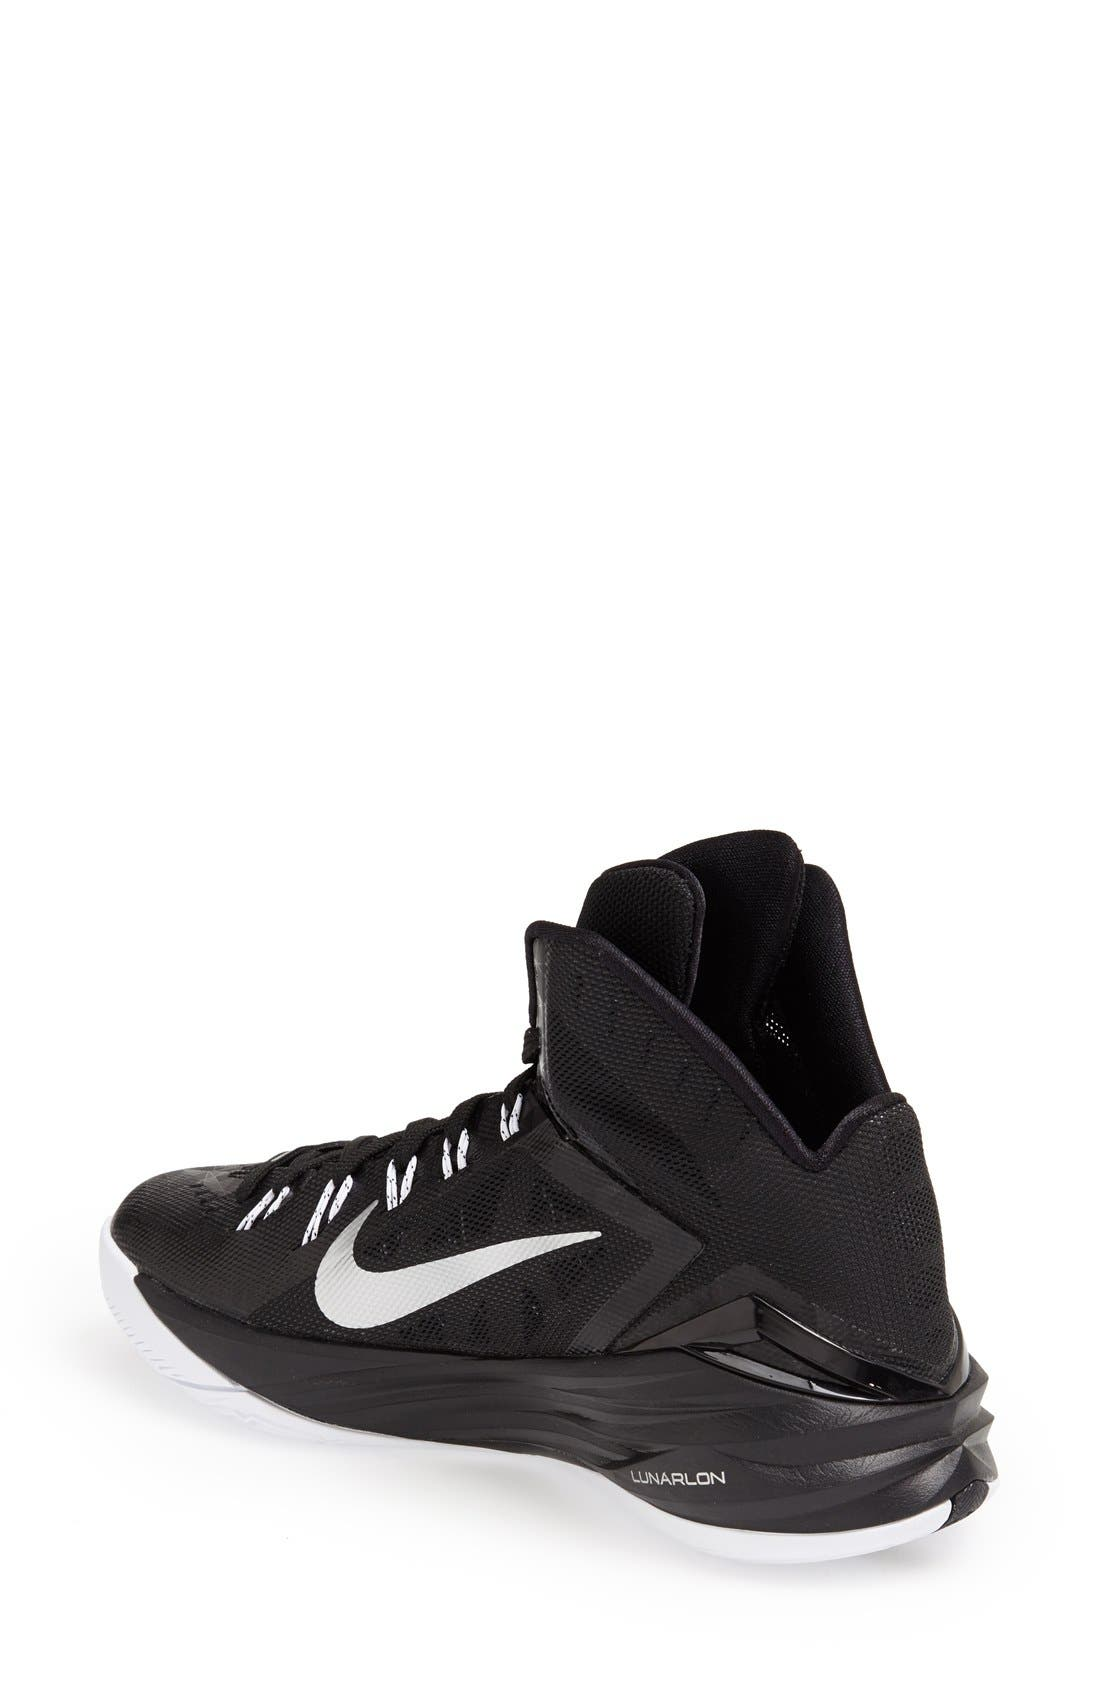 Alternate Image 2  - Nike 'Hyperdunk 2014' Basketball Shoe (Women)